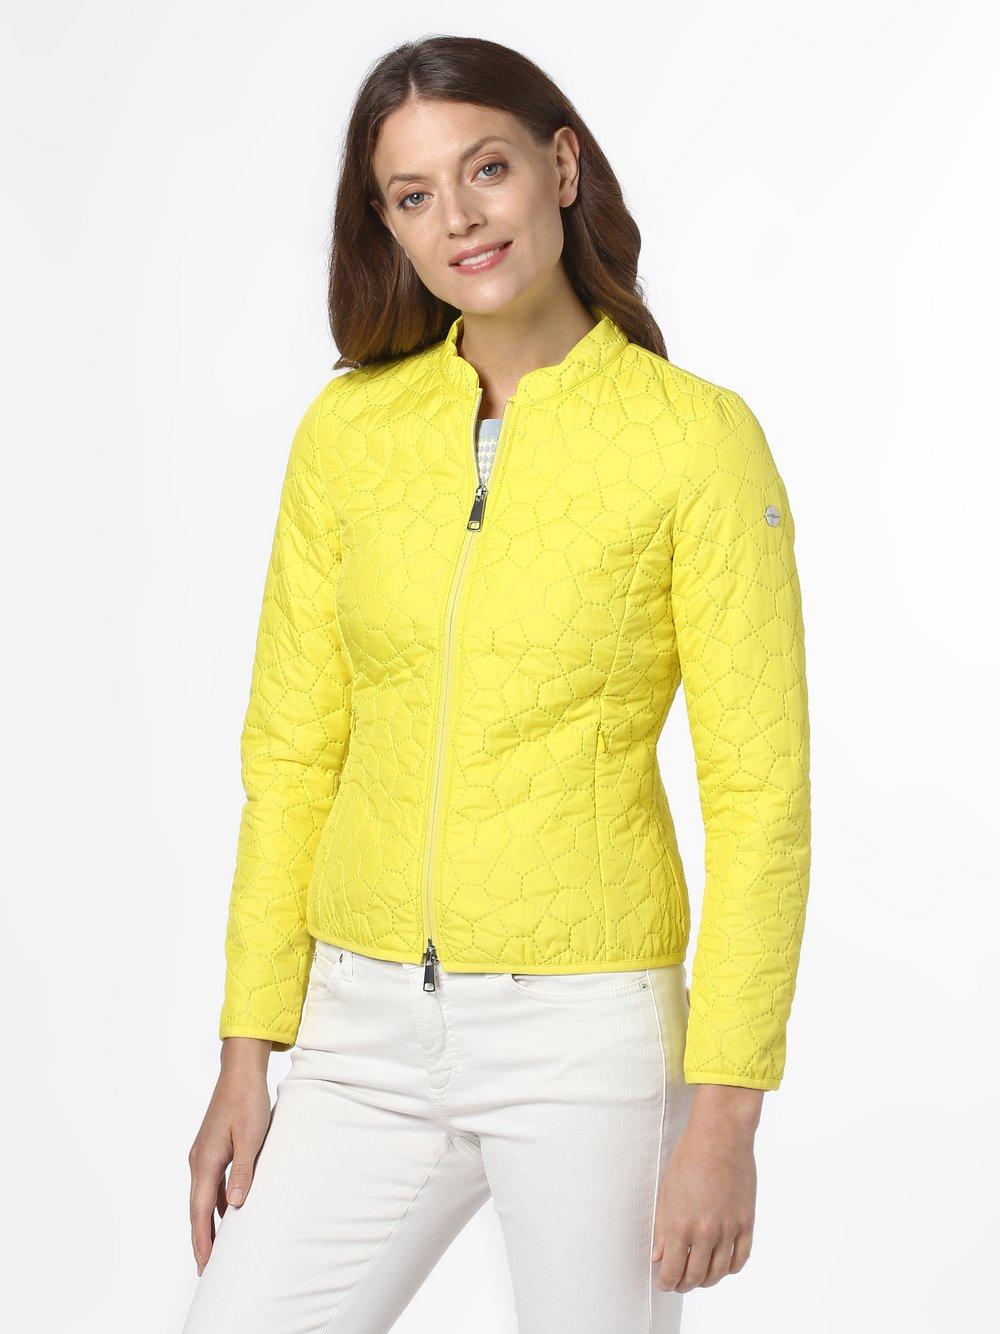 Taifun – Damska kurtka pikowana, żółty Van Graaf 467885-0001